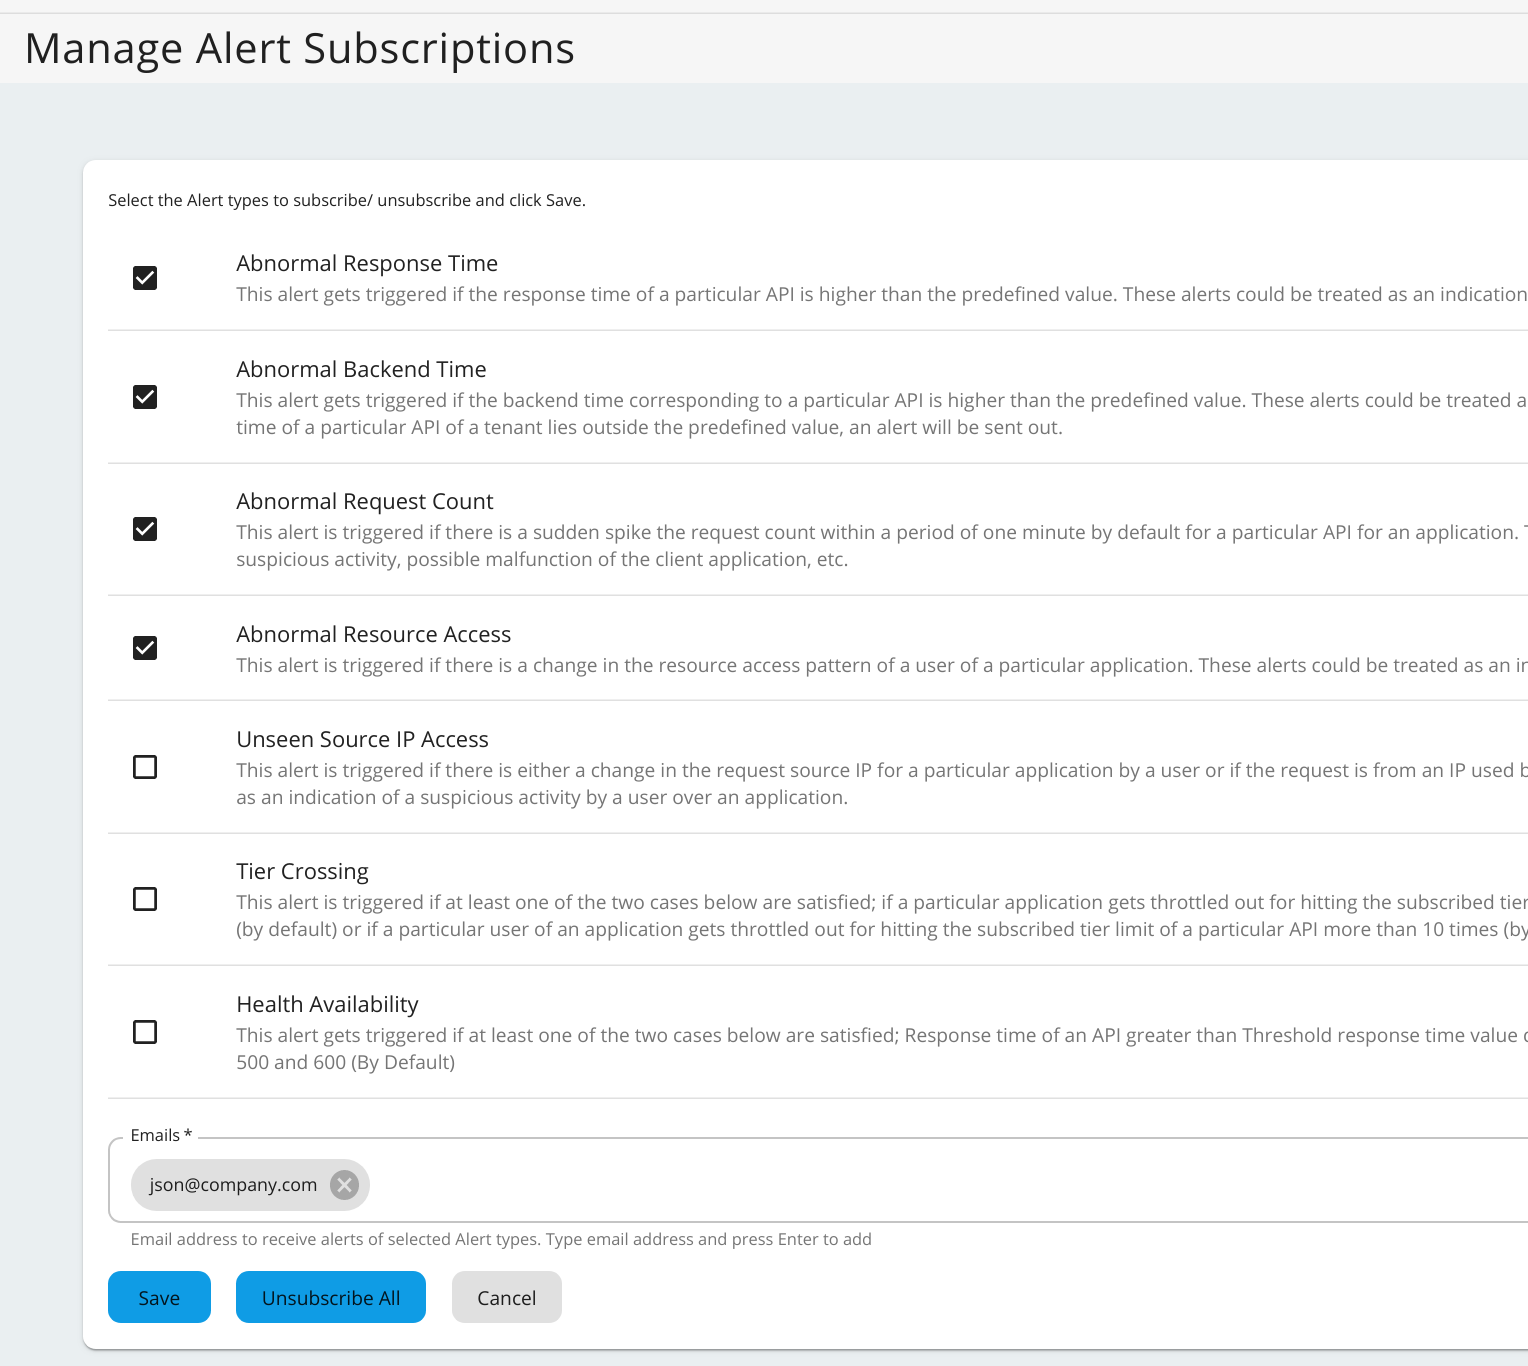 Unubscribe to alerts in admin portal